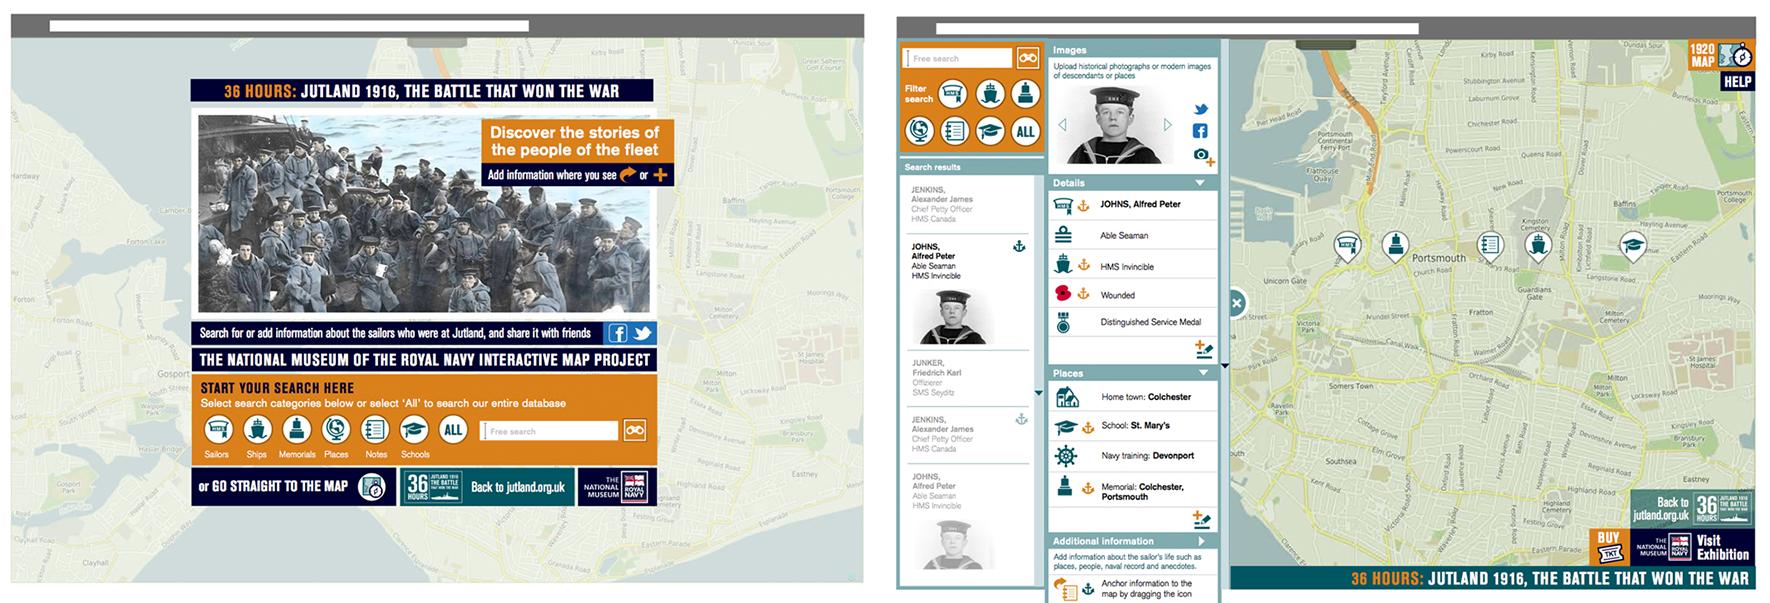 jutland,1914-1918, 1916, battle, naval, navy